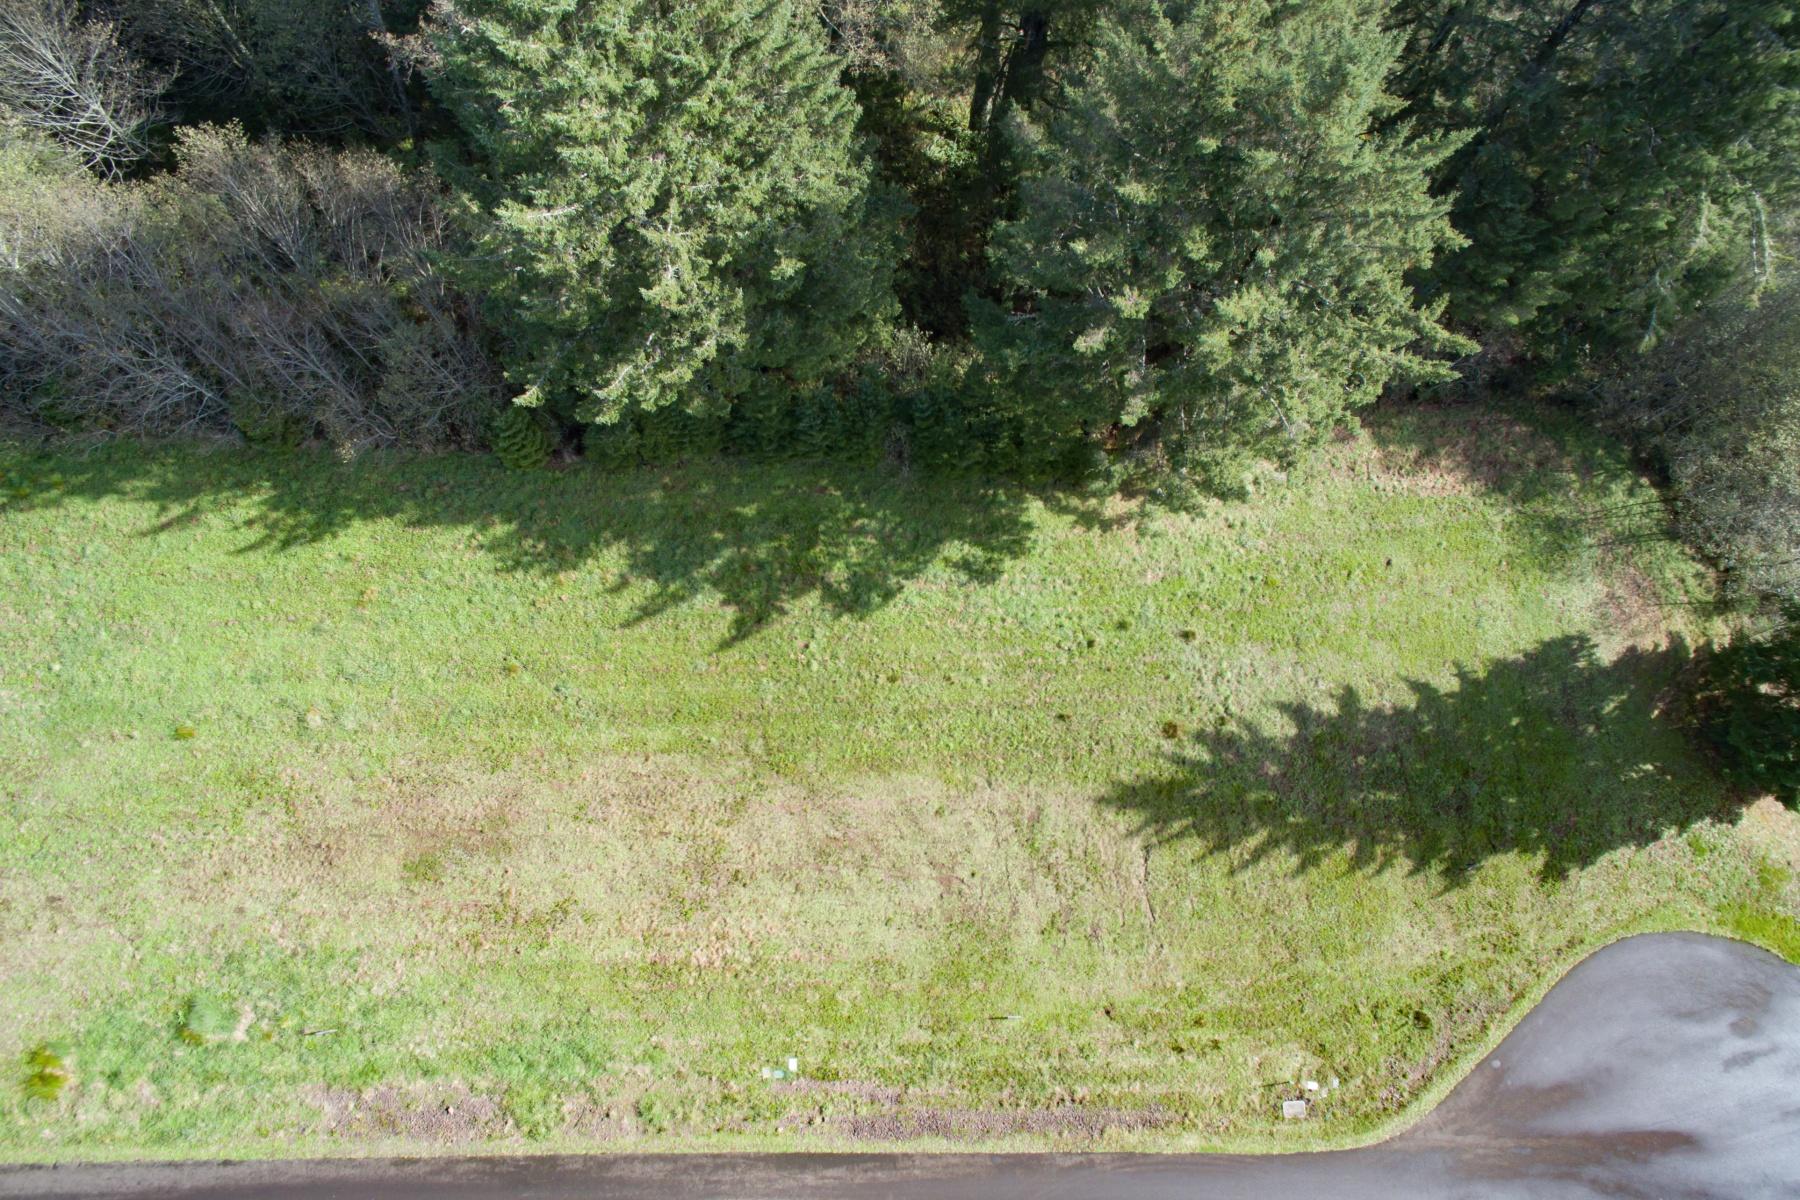 Đất đai vì Bán tại 8745 BRAERIDGE DR 34, MANZANITA, OR Manzanita, Oregon 97130 Hoa Kỳ